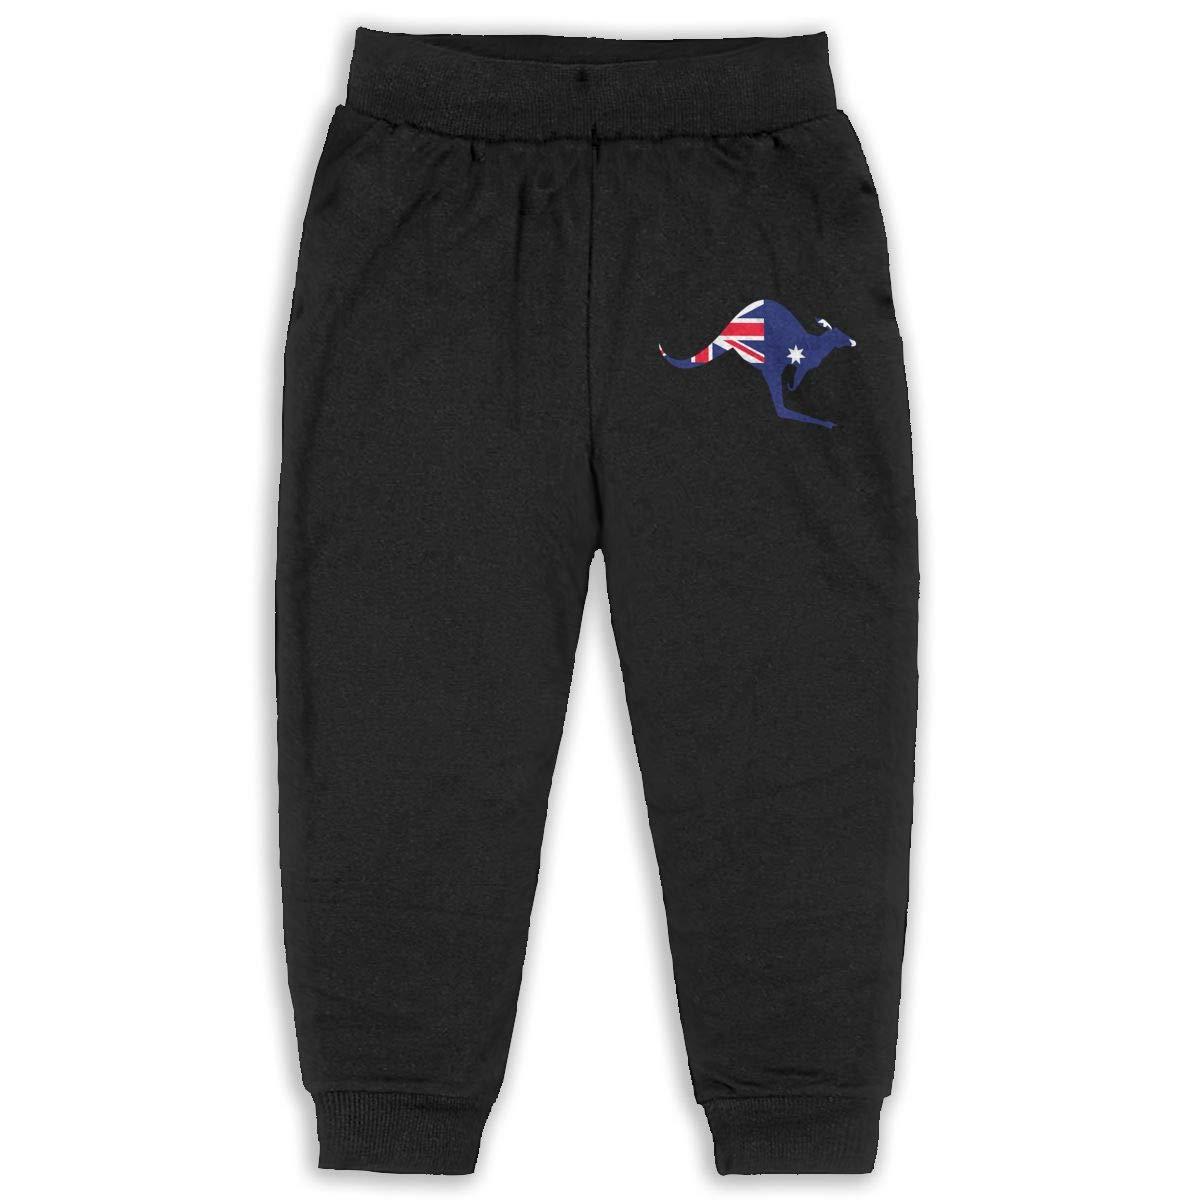 Australian Flag Kangaroo Kids Cotton Sweatpants,Jogger Long Jersey Sweatpants